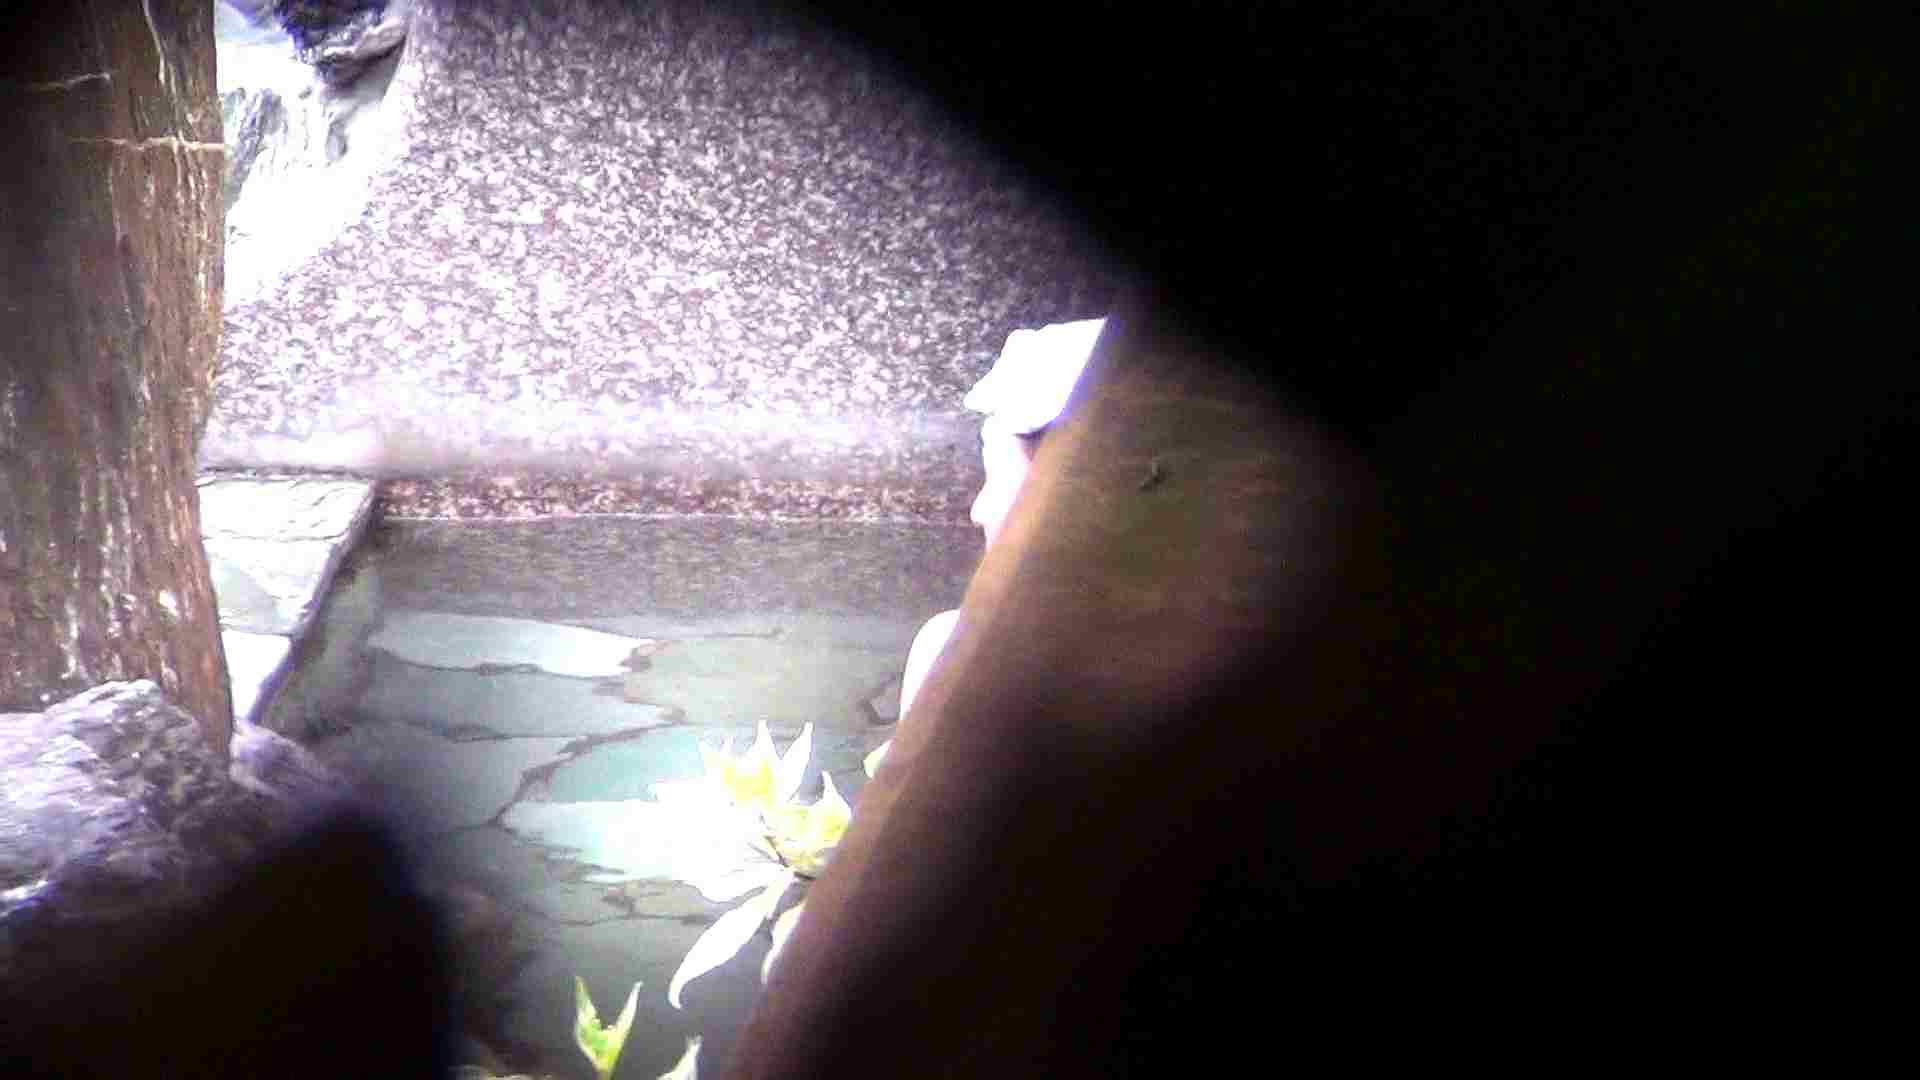 Vol.60 細身美女の股間から垂れているタコ糸 お姉さん攻略 おめこ無修正動画無料 74画像 74